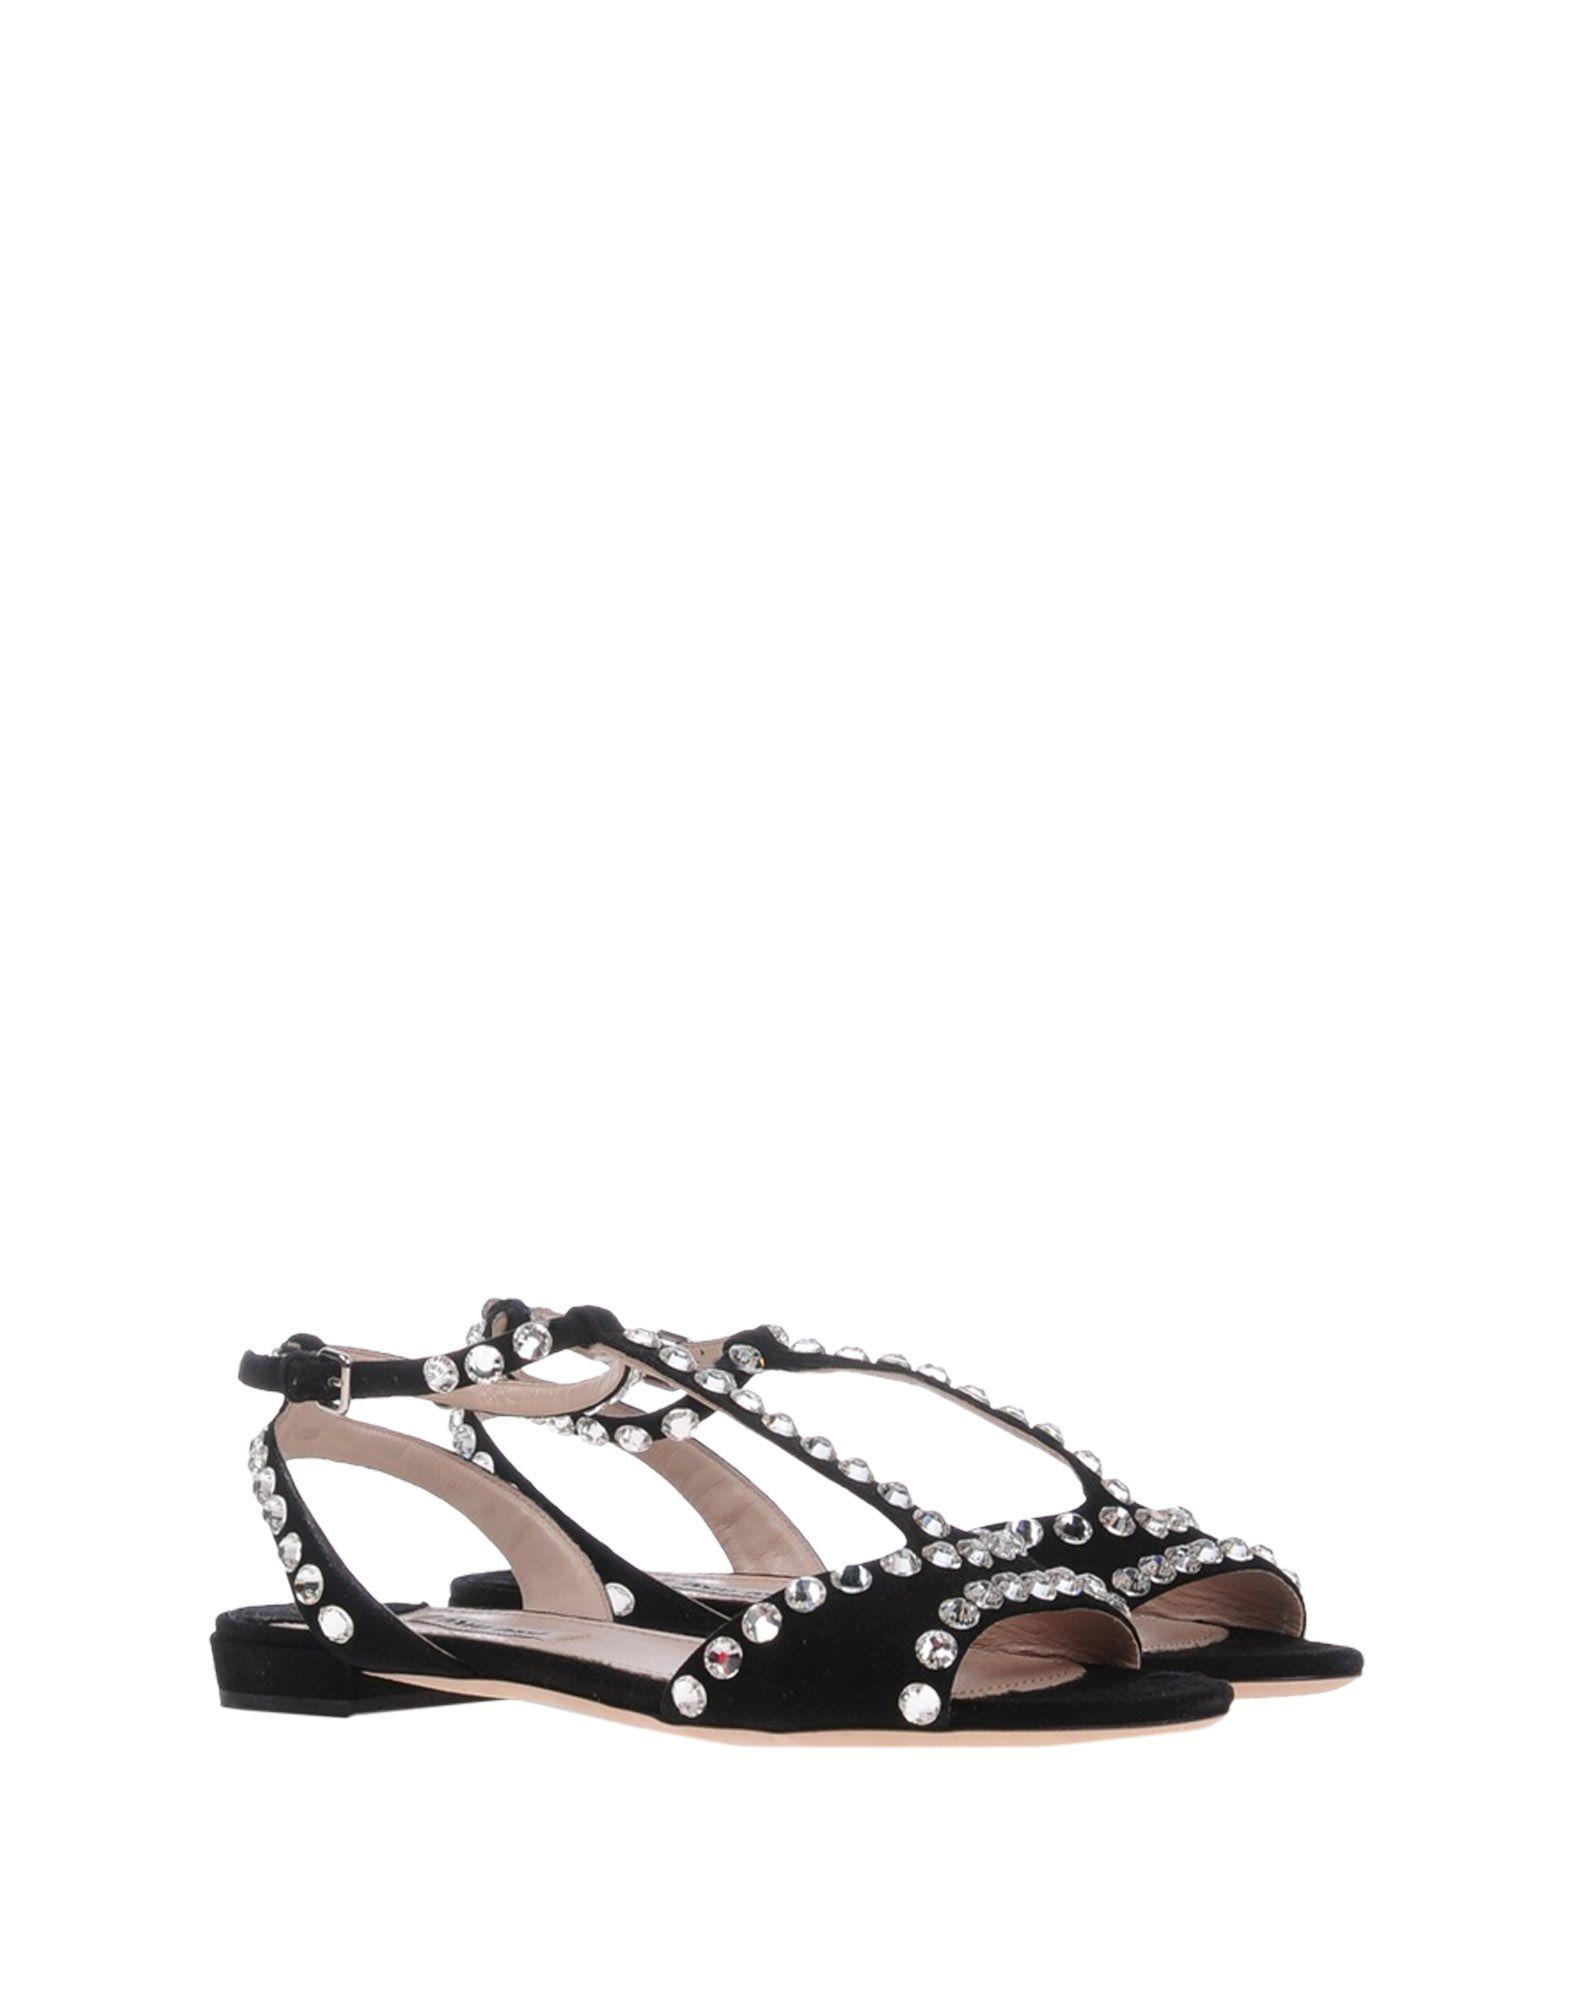 Sandales Miu Miu Femme - Sandales Miu Miu sur